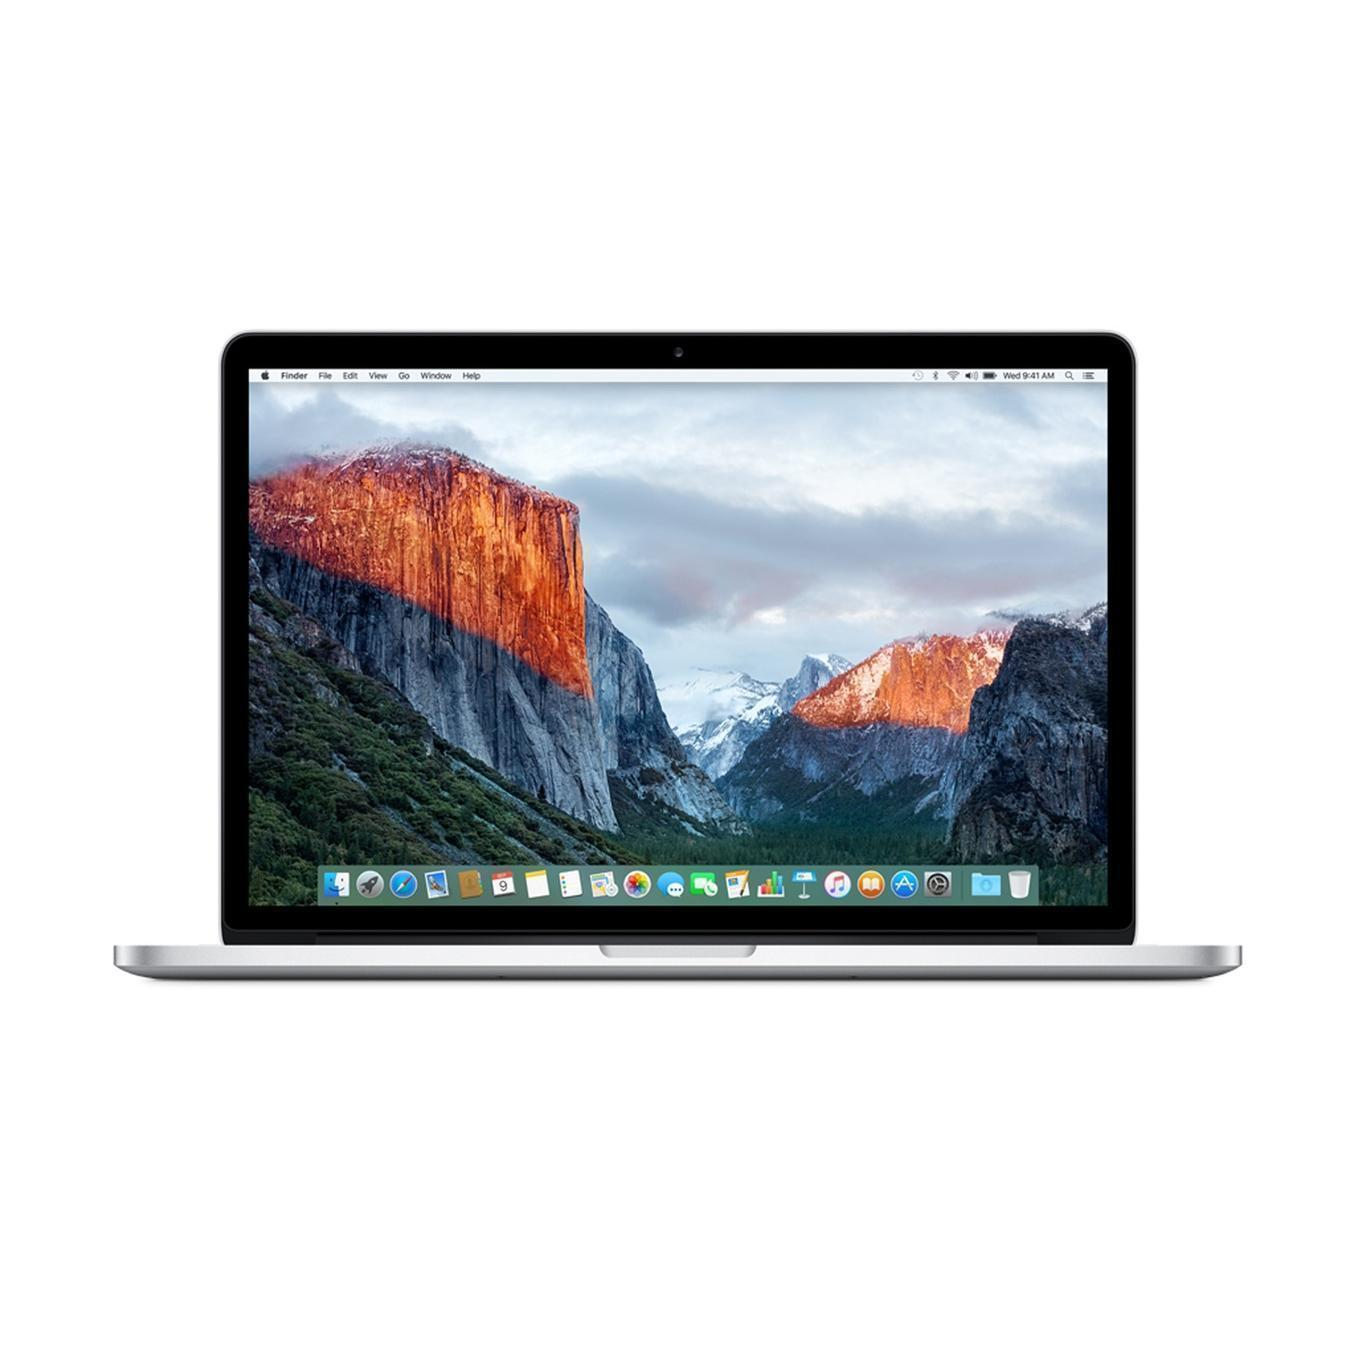 MacBook Pro Retina 15,4-inch (2015) - Core i7 - 16GB - SSD 512 GB AZERTY - Francês